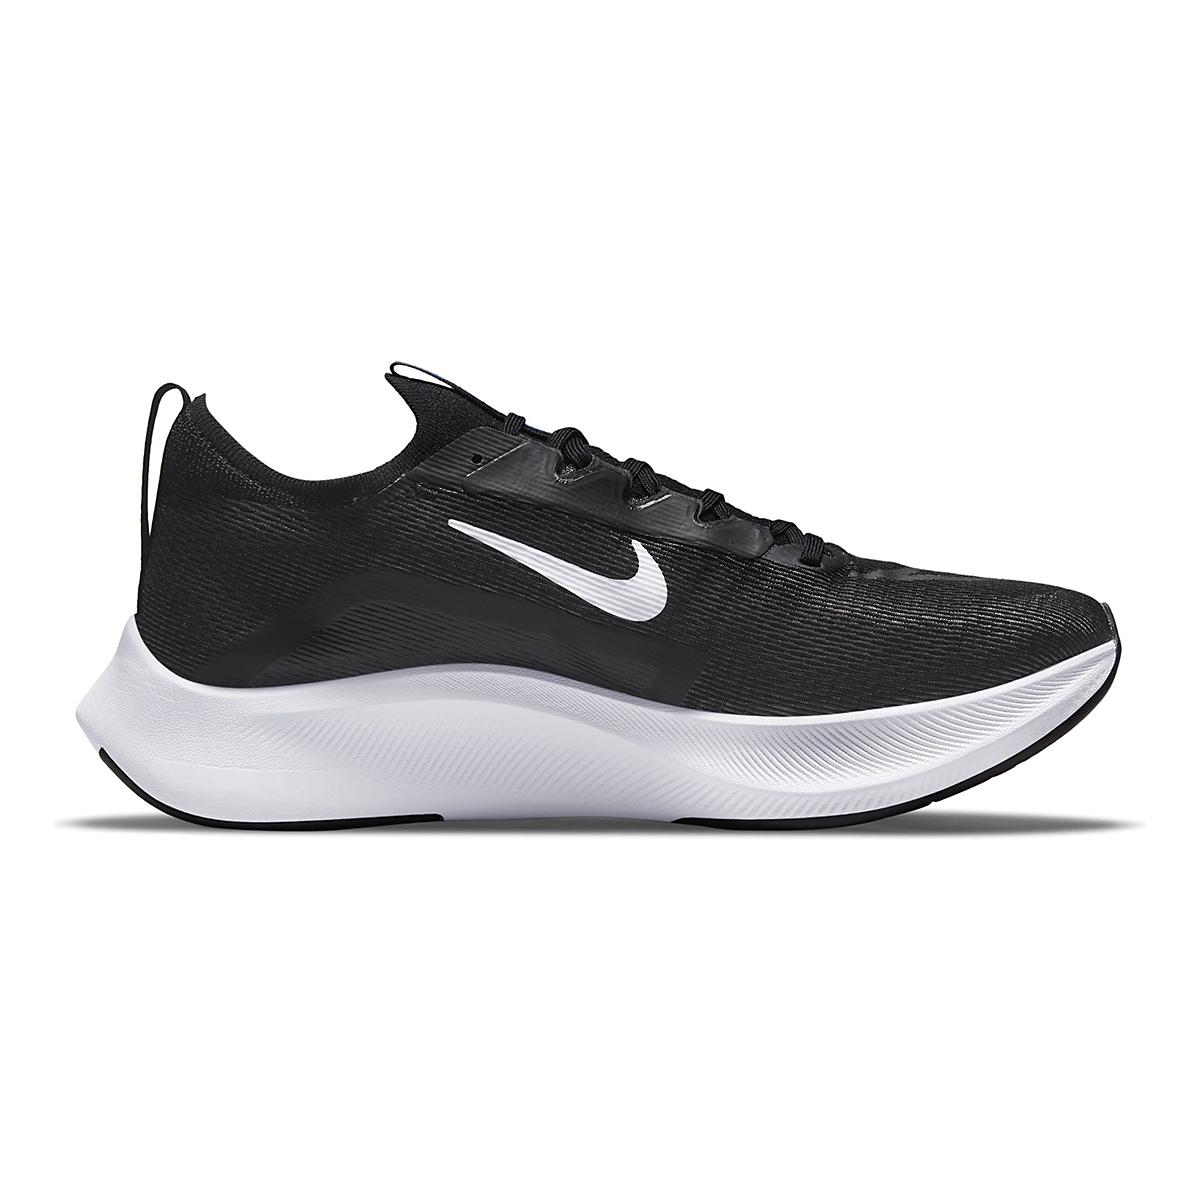 Men's Nike Zoom Fly 4 Running Shoe - Color: Black/White/Anthracite/Racer Blue - Size: 6 - Width: Regular, Black/White/Anthracite/Racer Blue, large, image 1